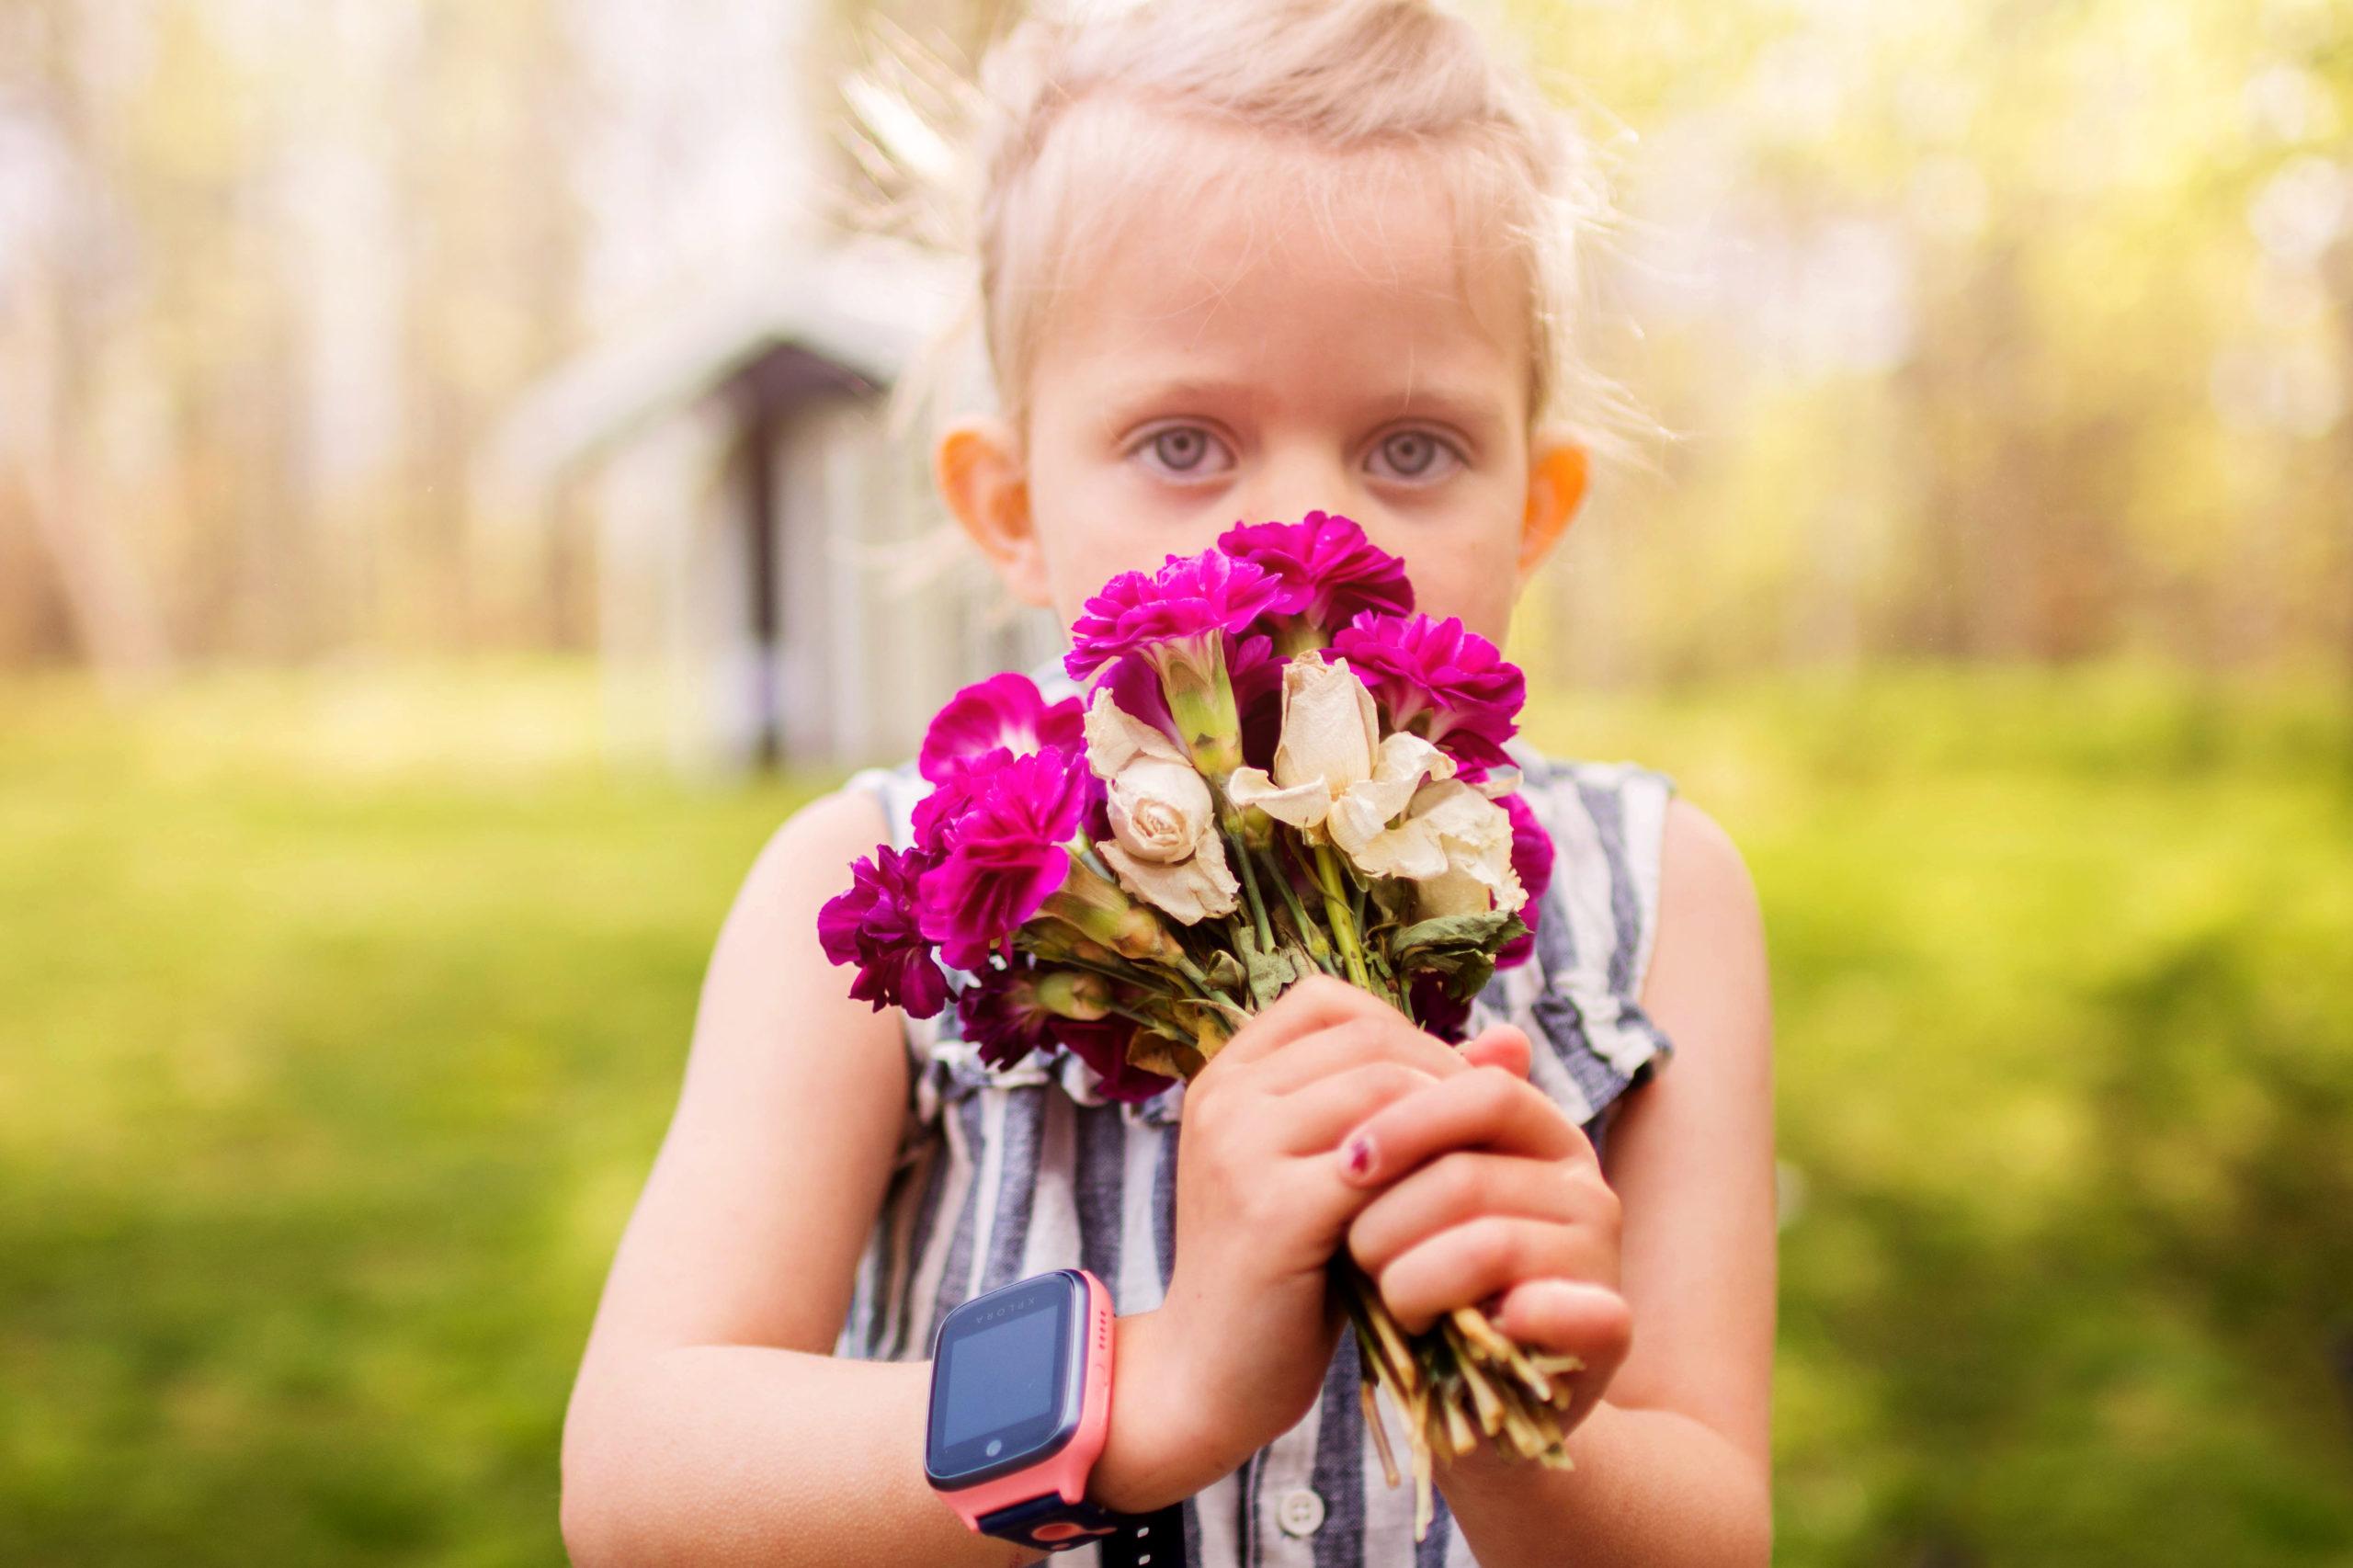 barn-med-blomster-xplora